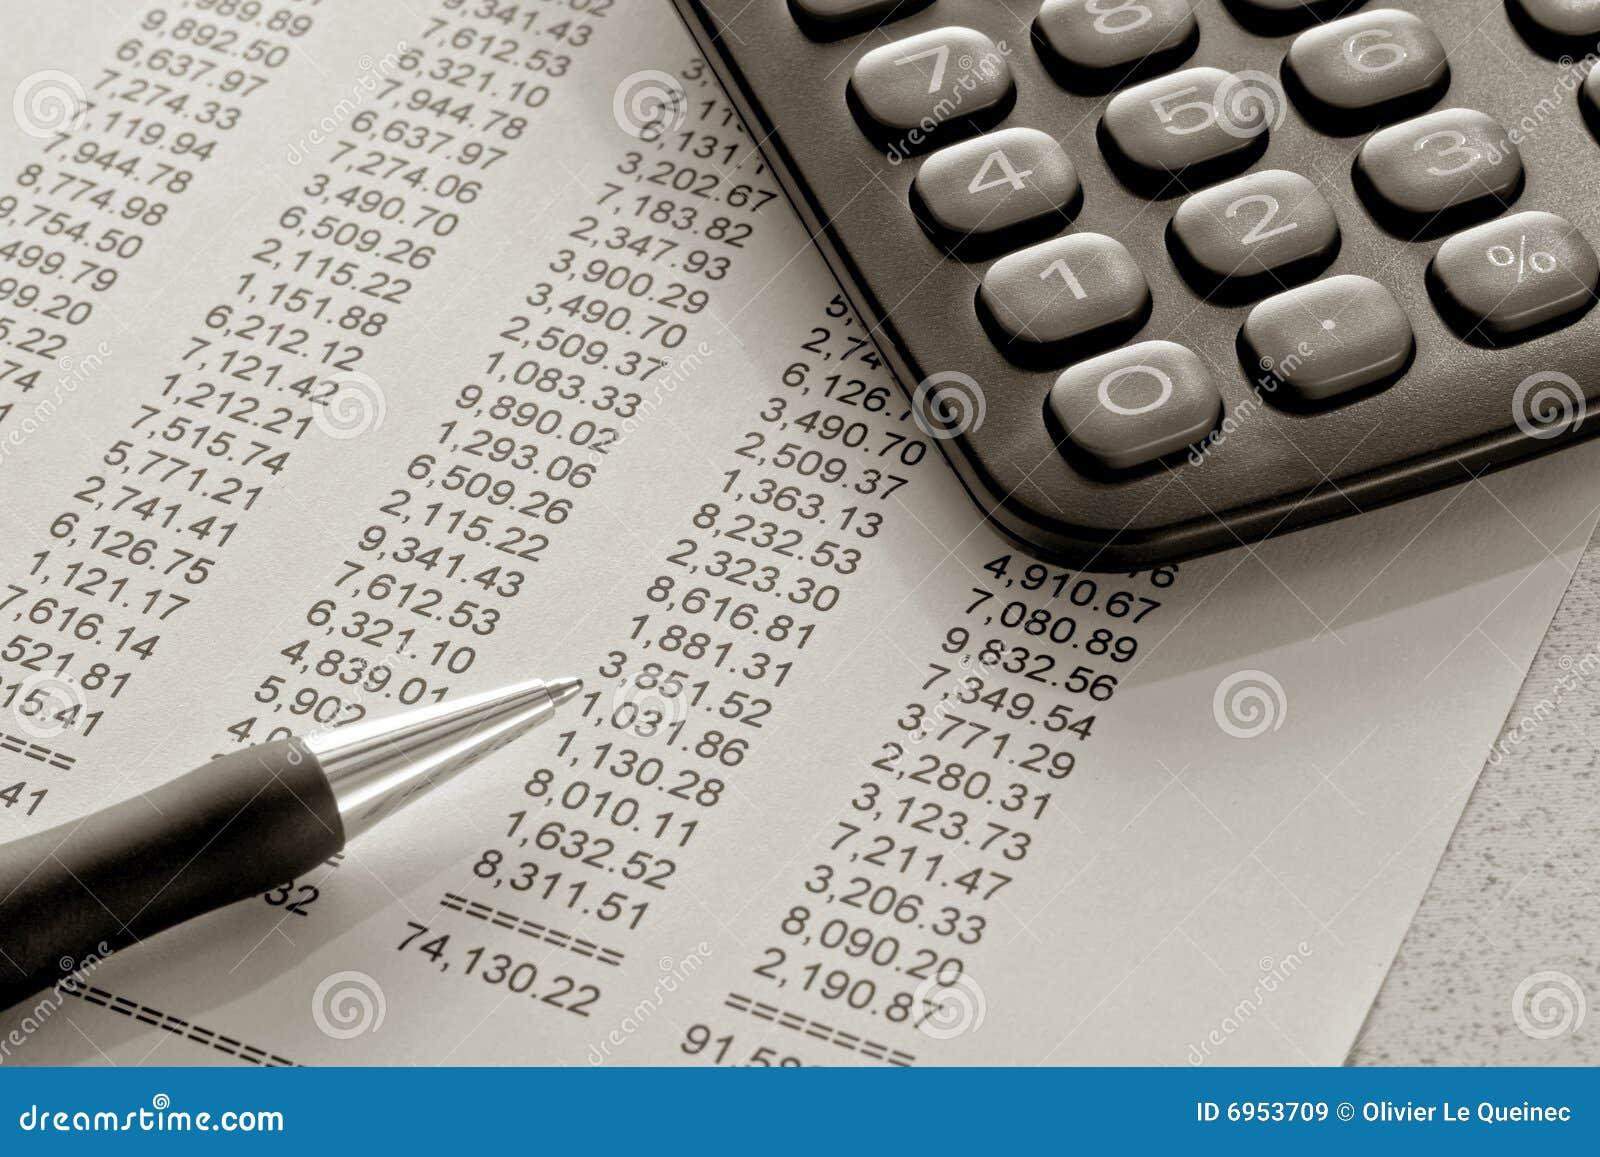 Trading brokerage calculator india